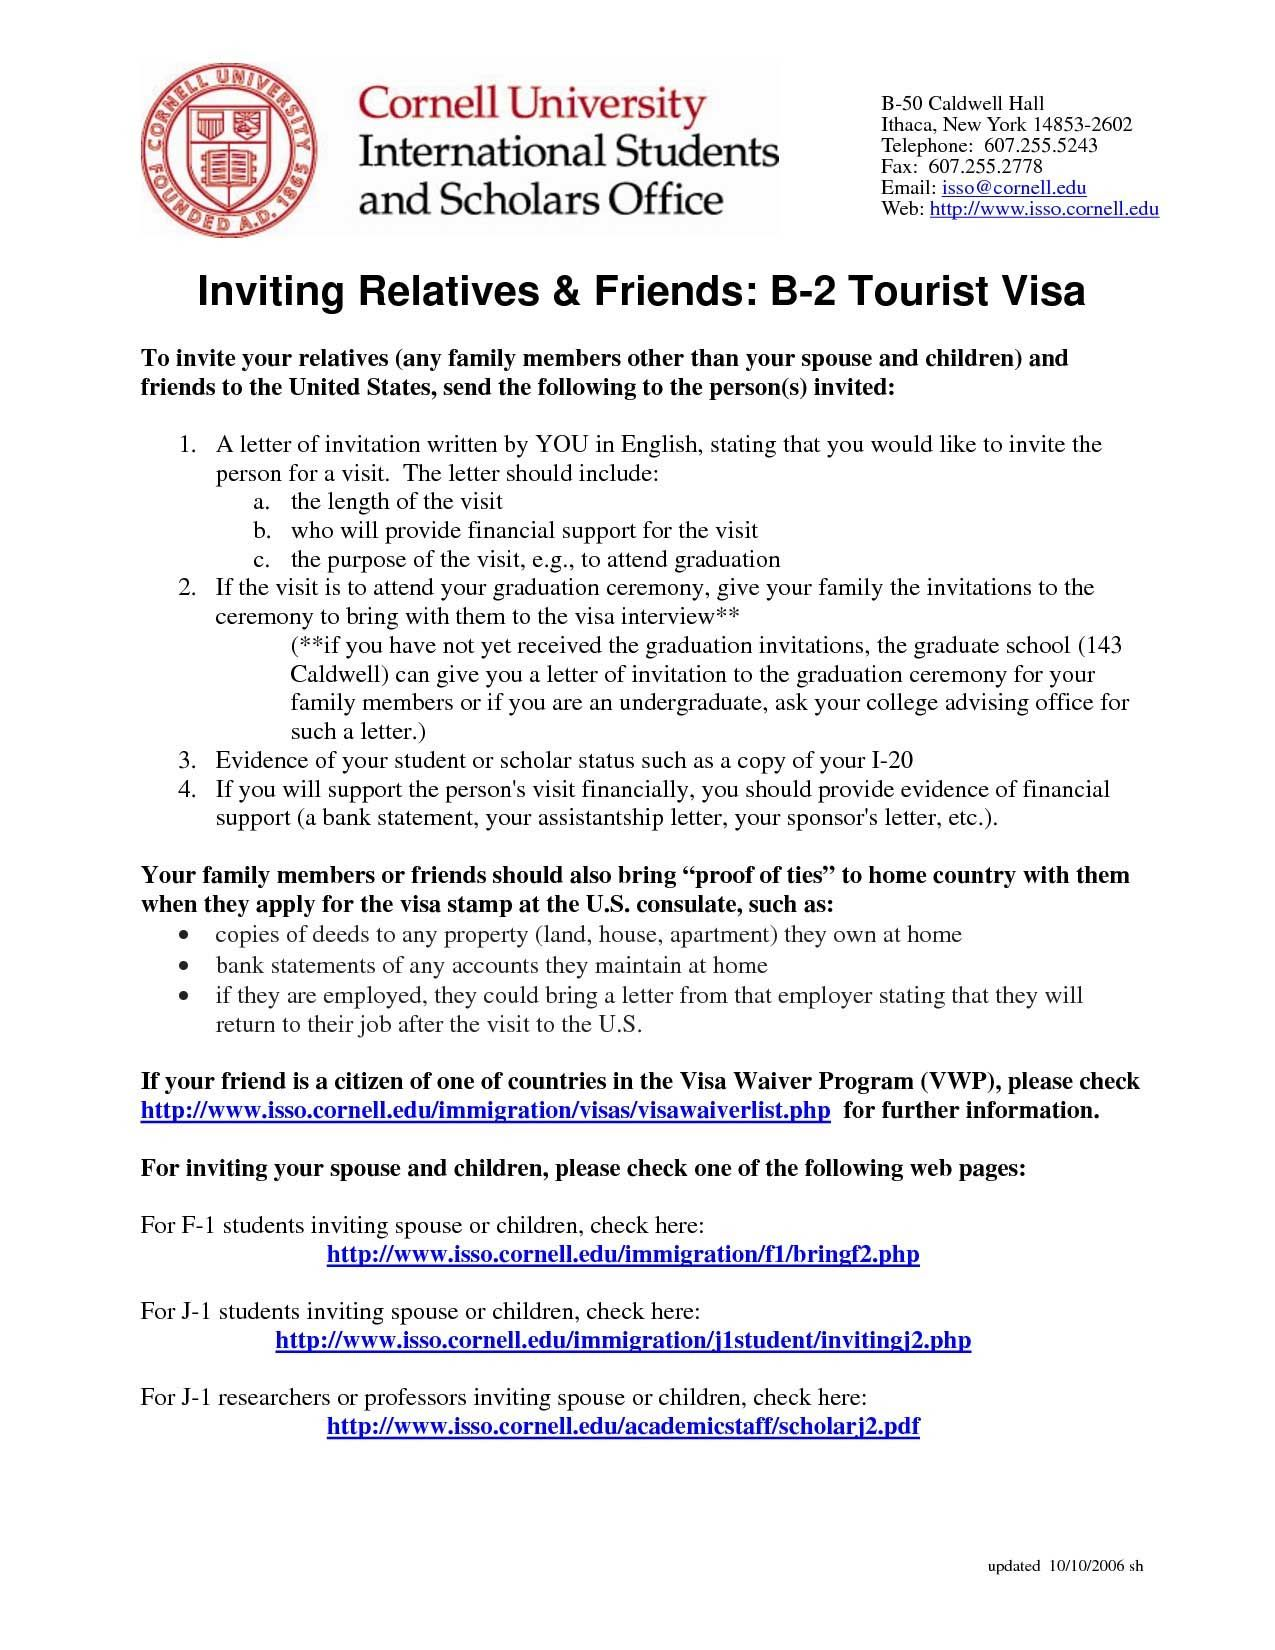 10 invitation letter for us visa sample